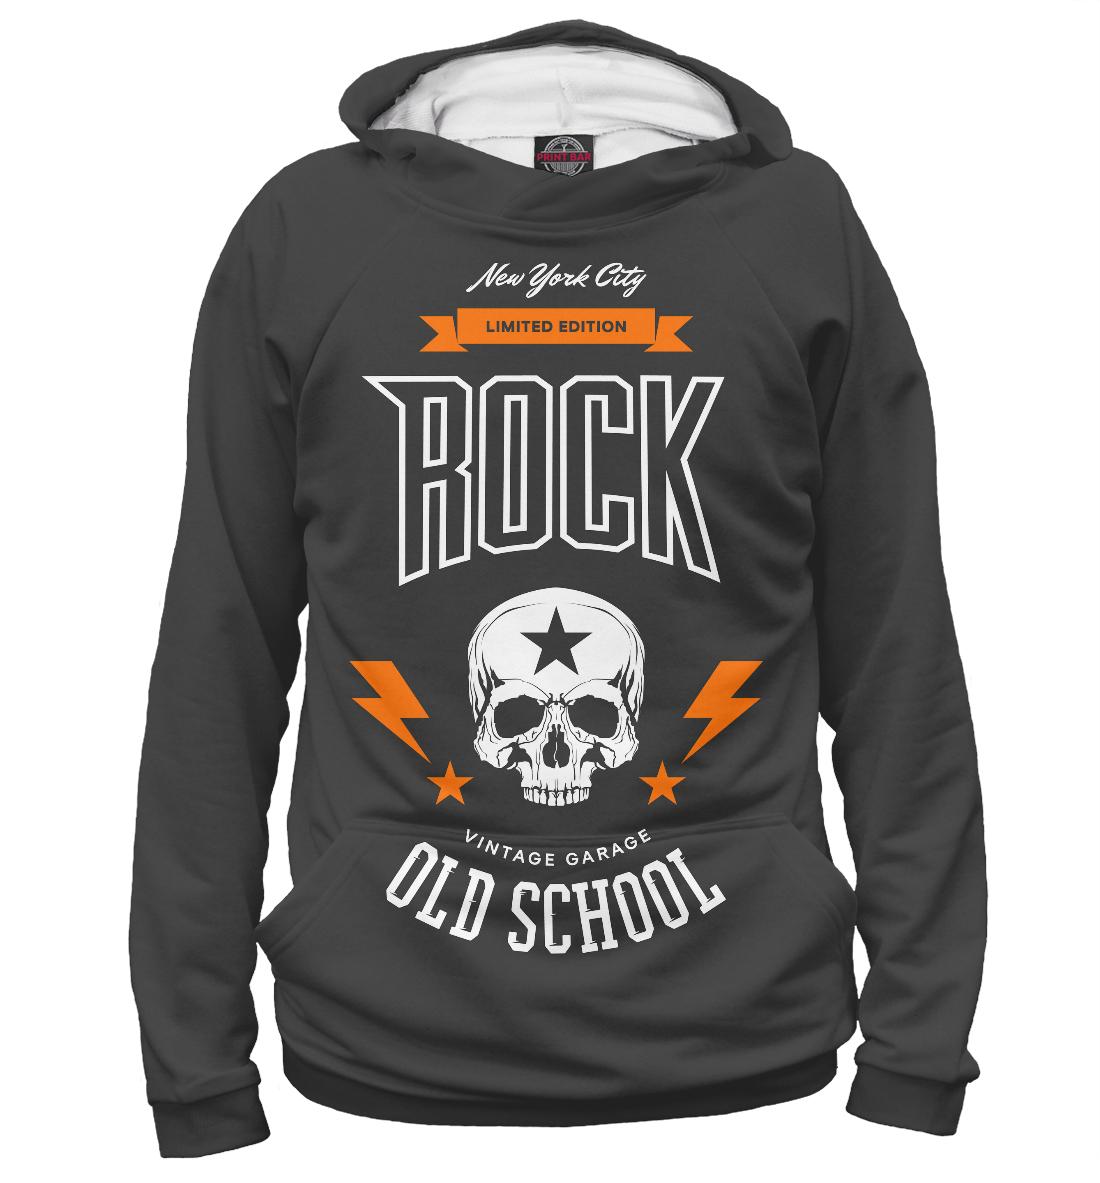 Rock Music mikael niemi popular music